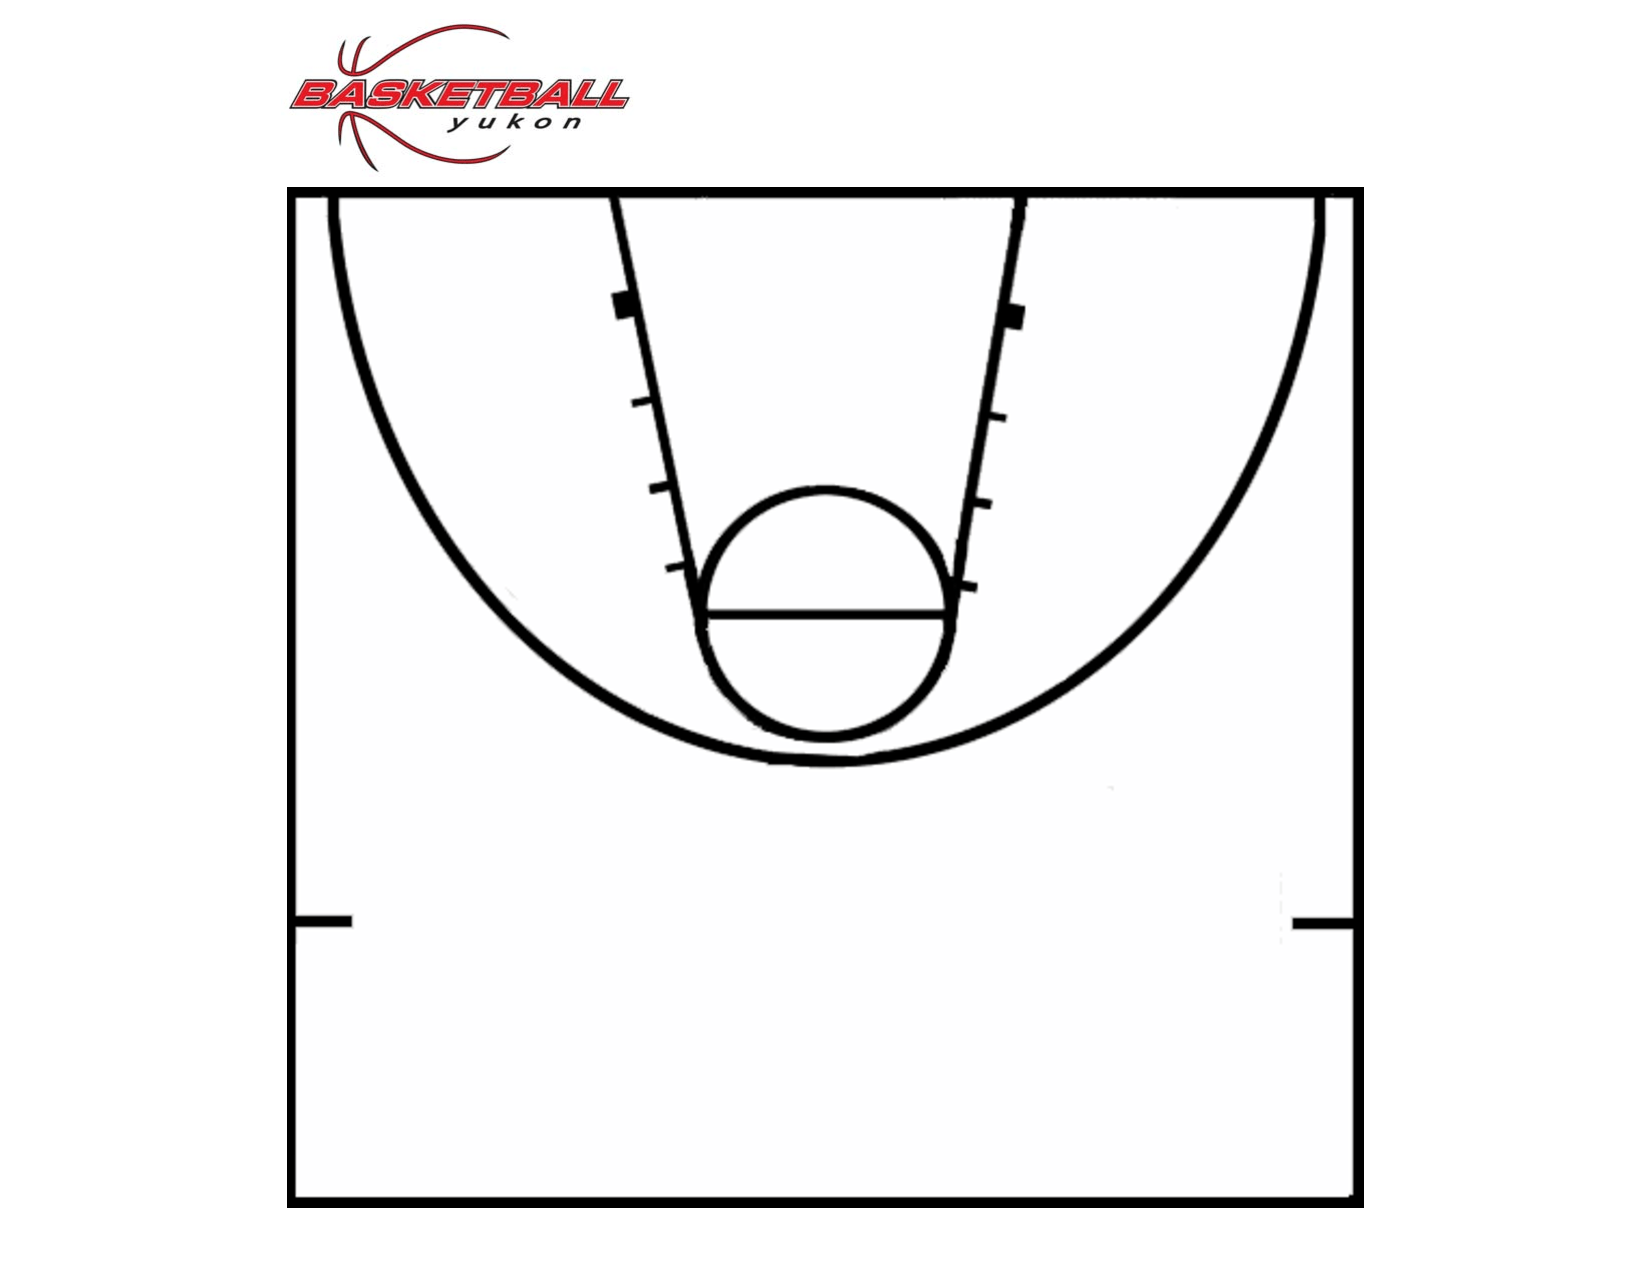 Basketball Court Diagram Printable Diagrams